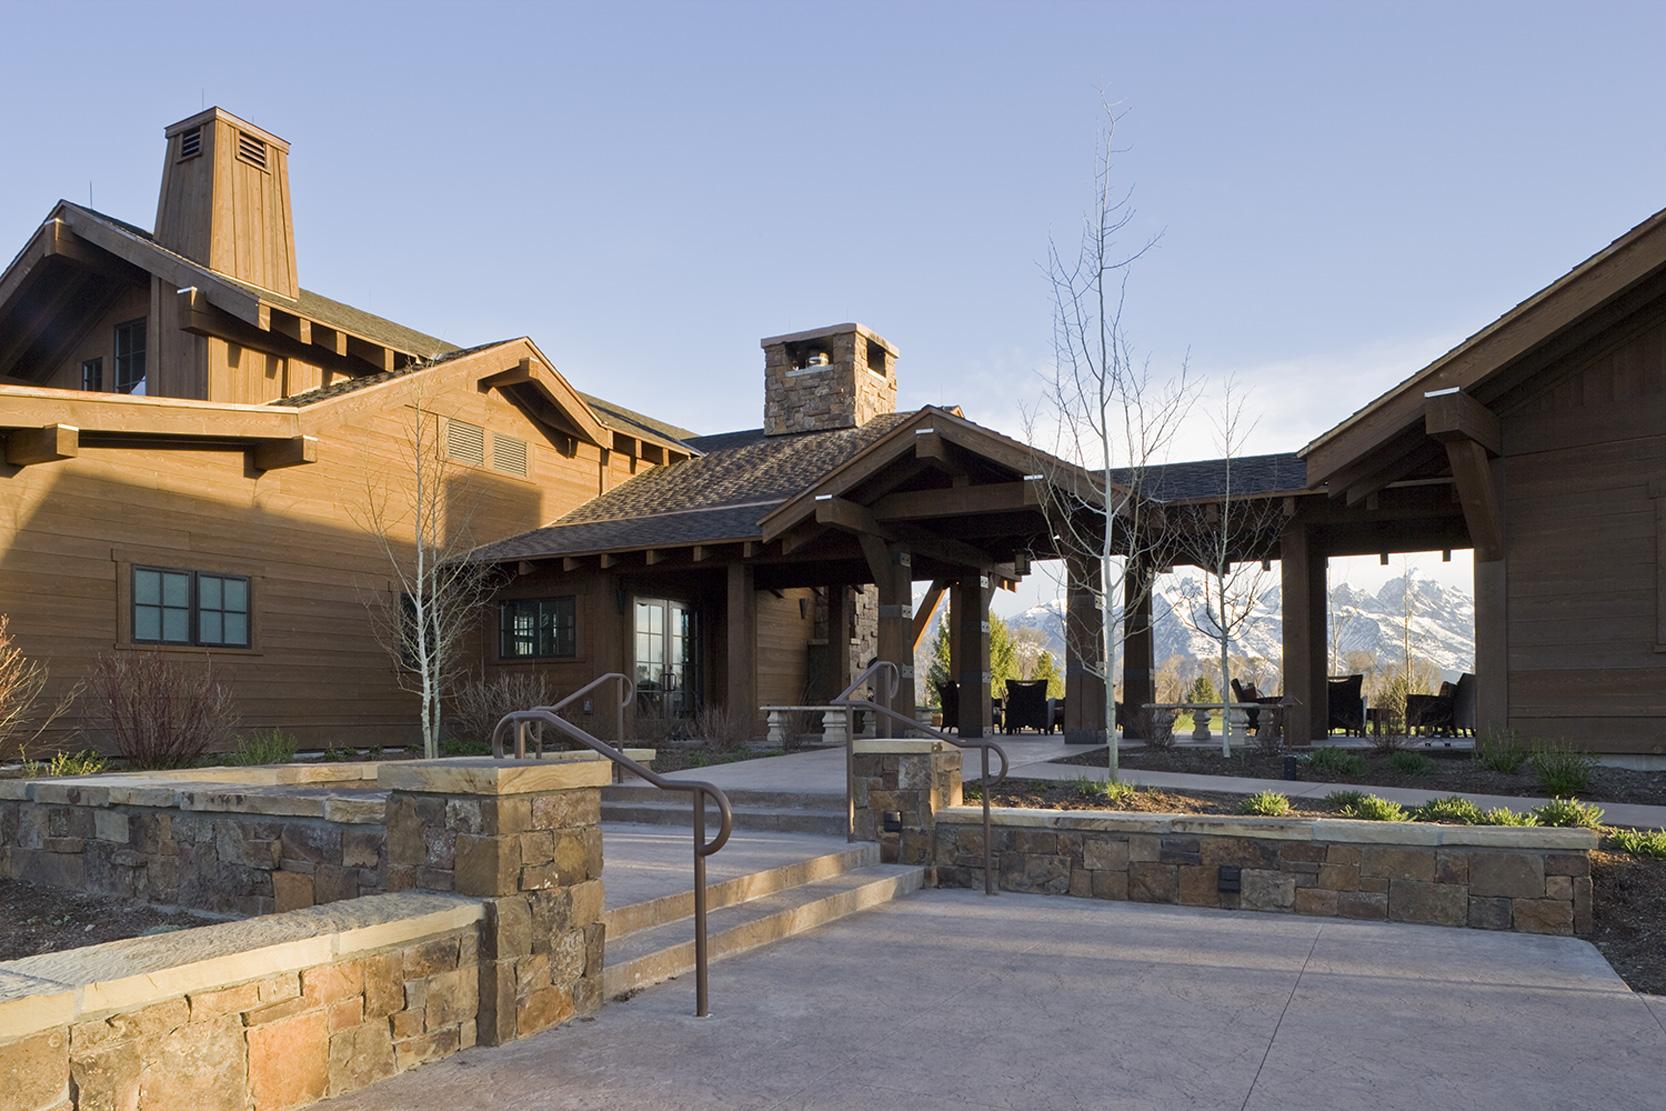 Jackson Hole Golf & Tennis Club, Jackson Hole, Wyoming